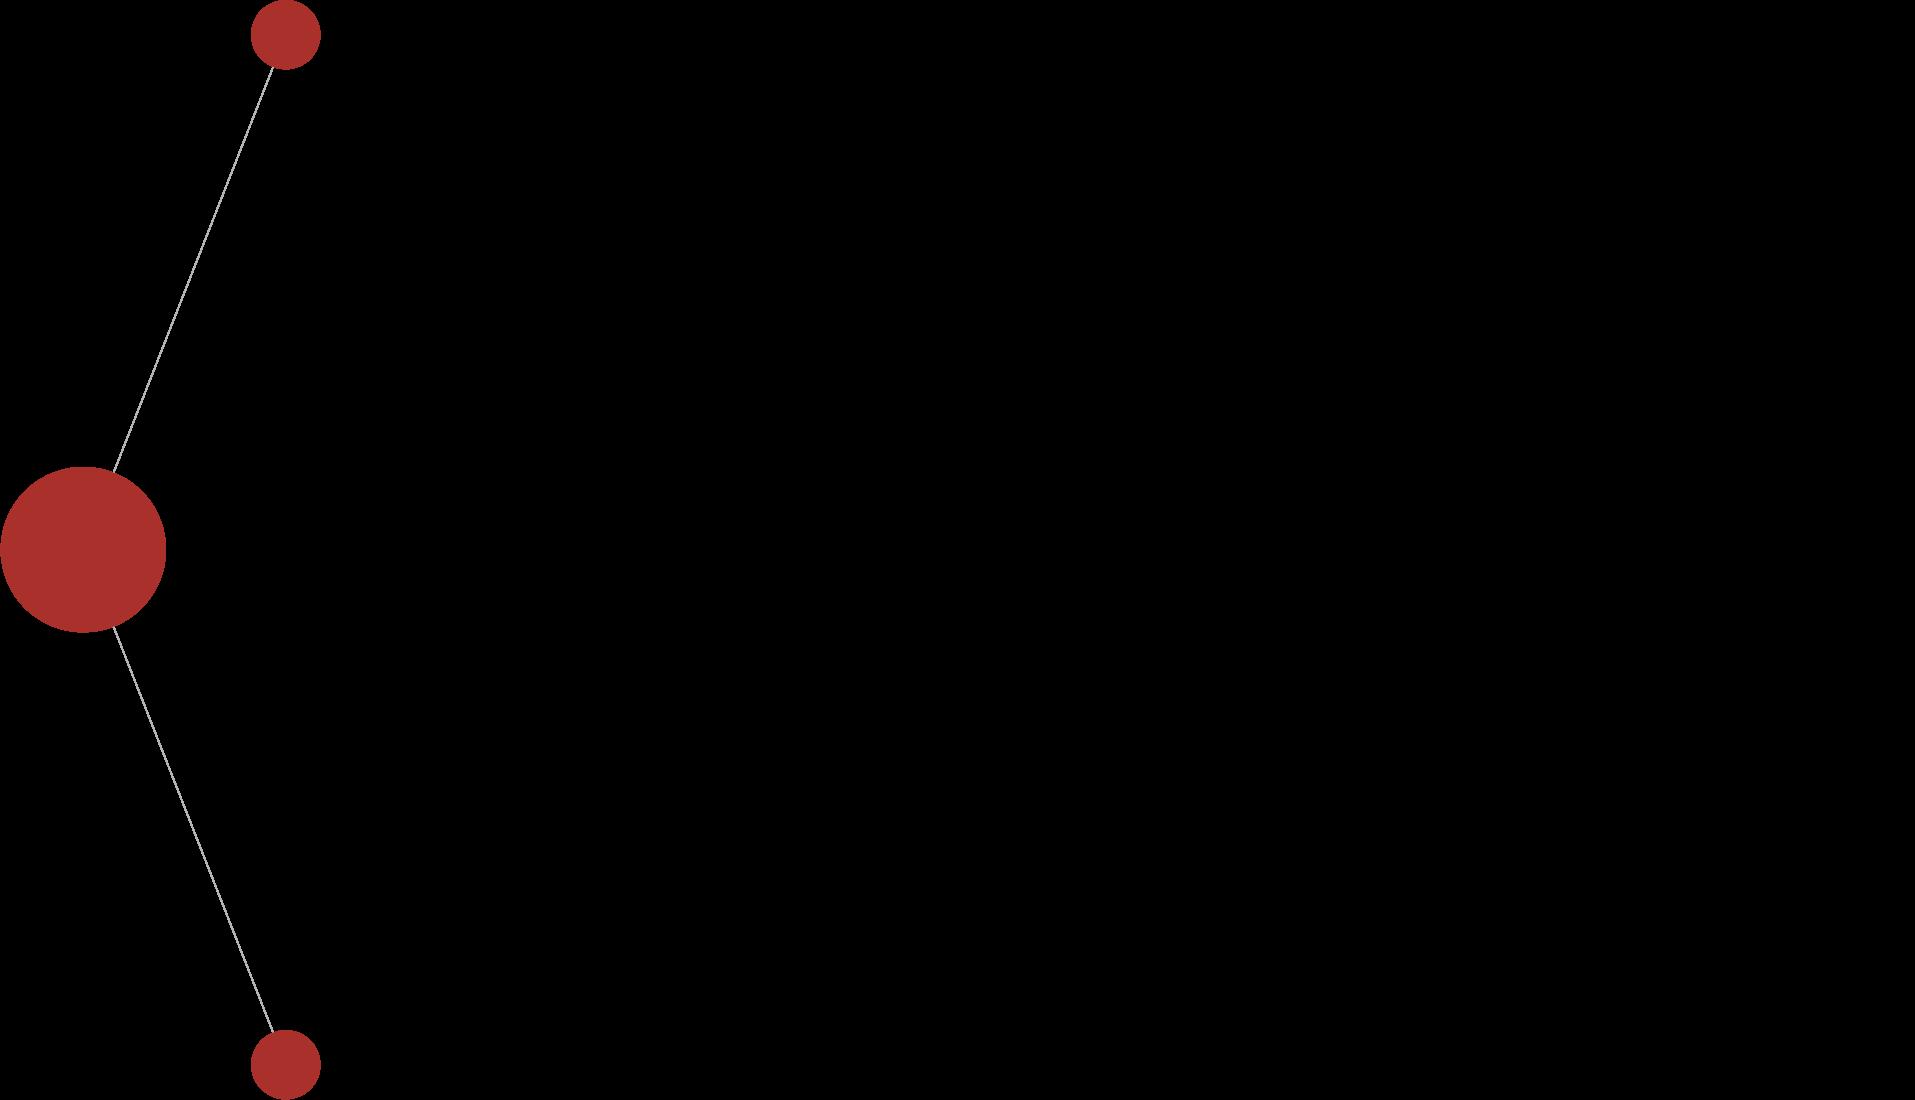 logo ECM QUALITY NETWORK.png (63 KB)